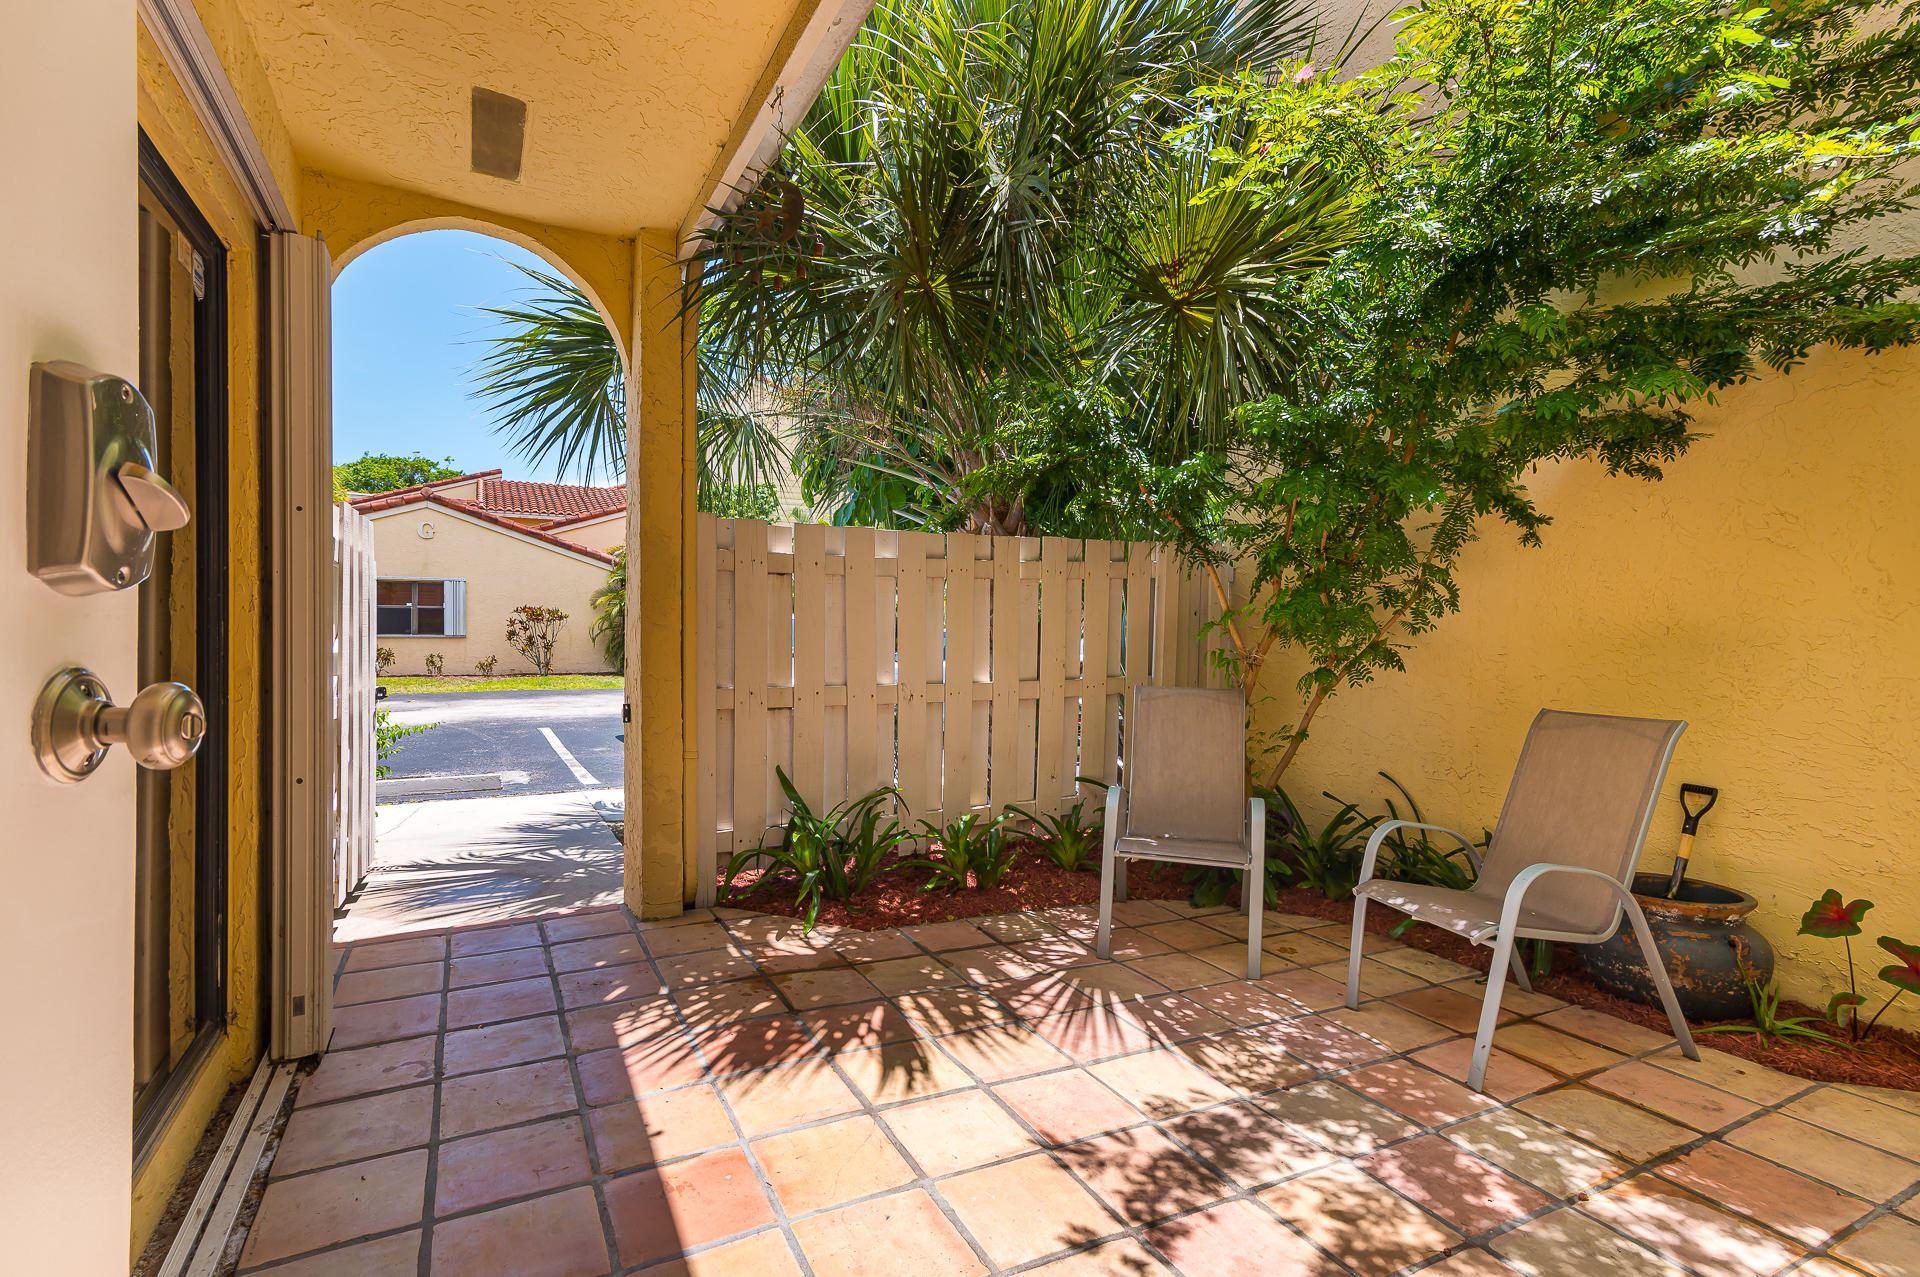 22350 Pineapple Walk Drive, Boca Raton, FL 33433 - #: RX-10723741